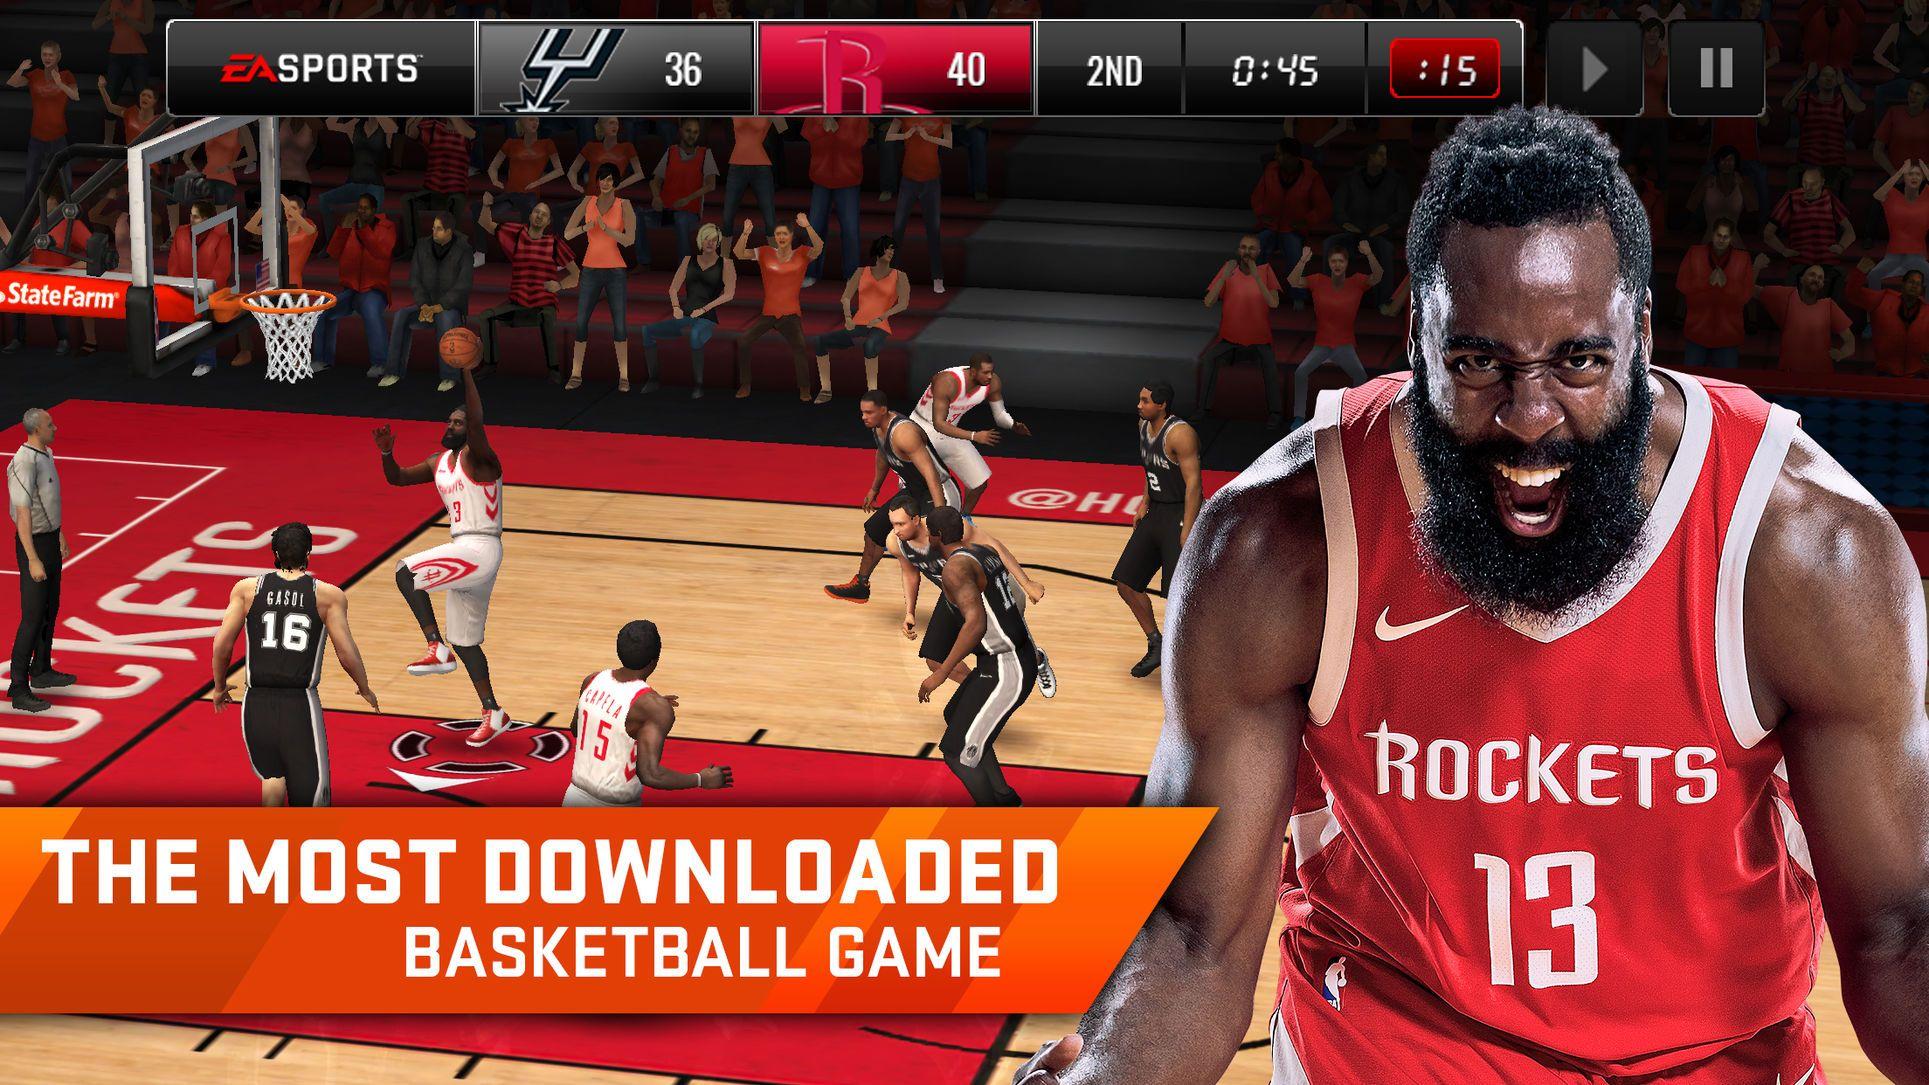 Nba Live Mobile Basketball Games Arts Sports Ios Nba Live Mobile Hack Nba Live Basketball Games Online